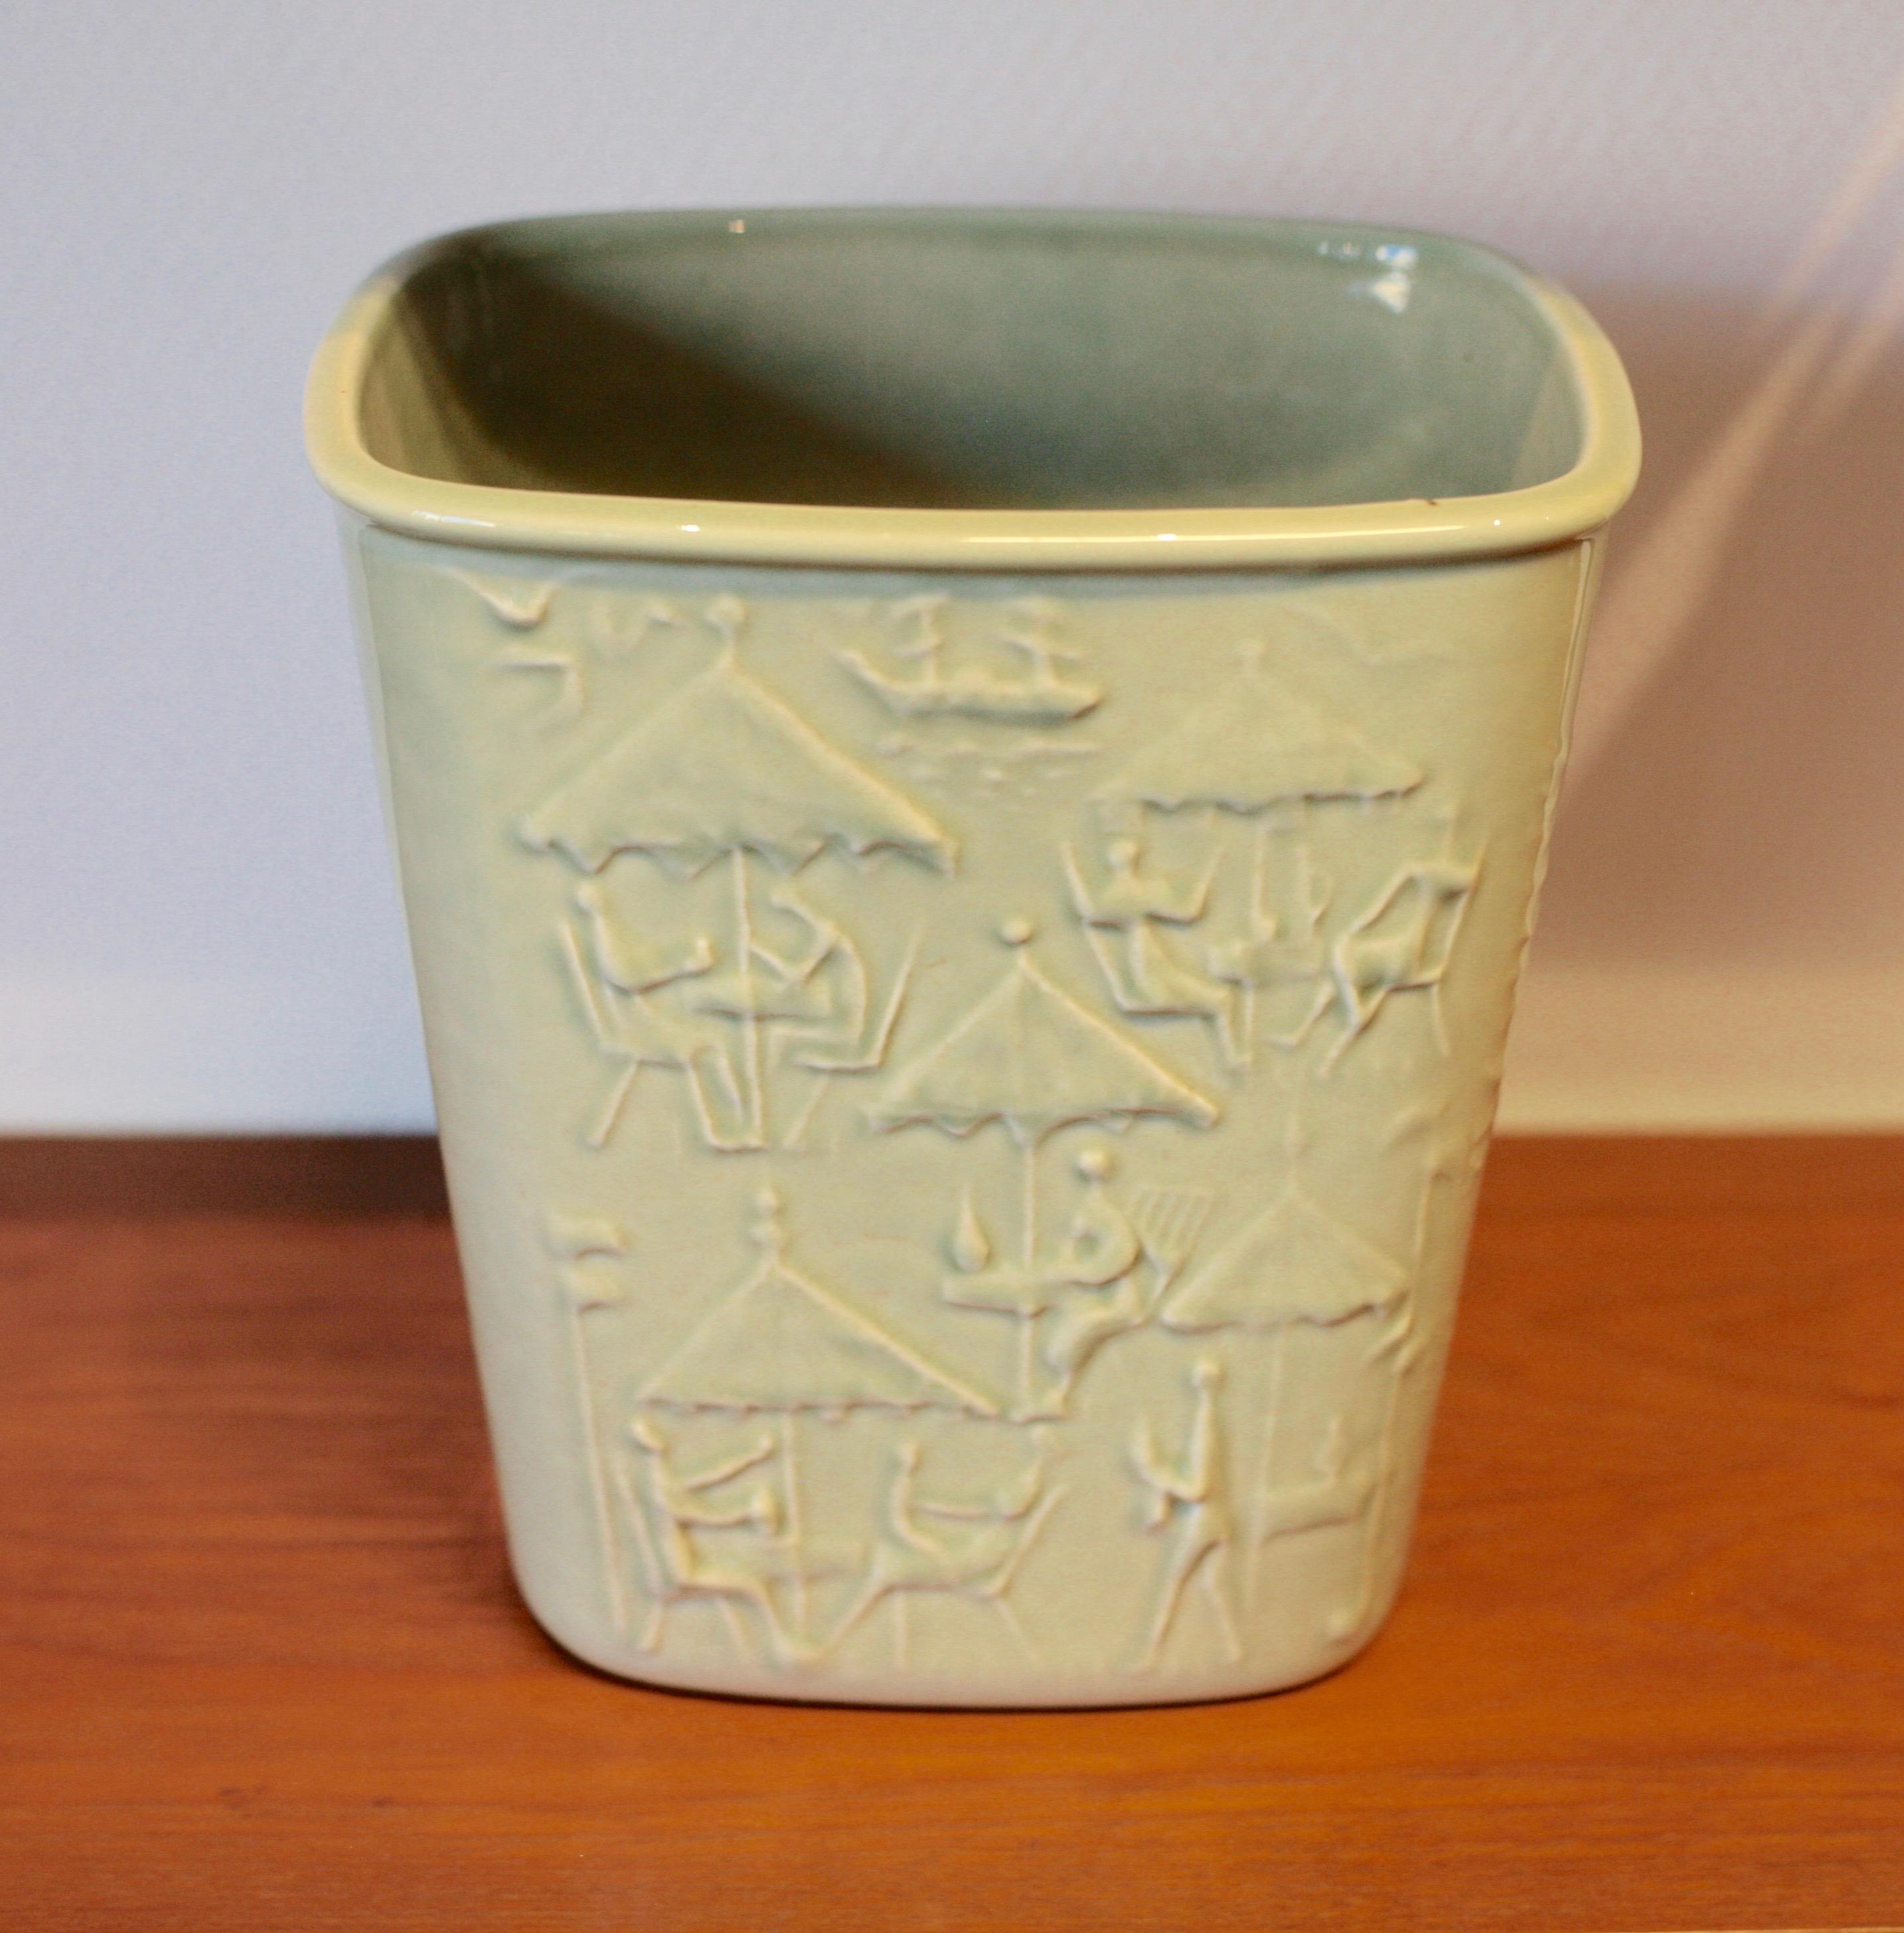 Porcelain wine cooler by Carl-Harry Stålhane for Orrefors